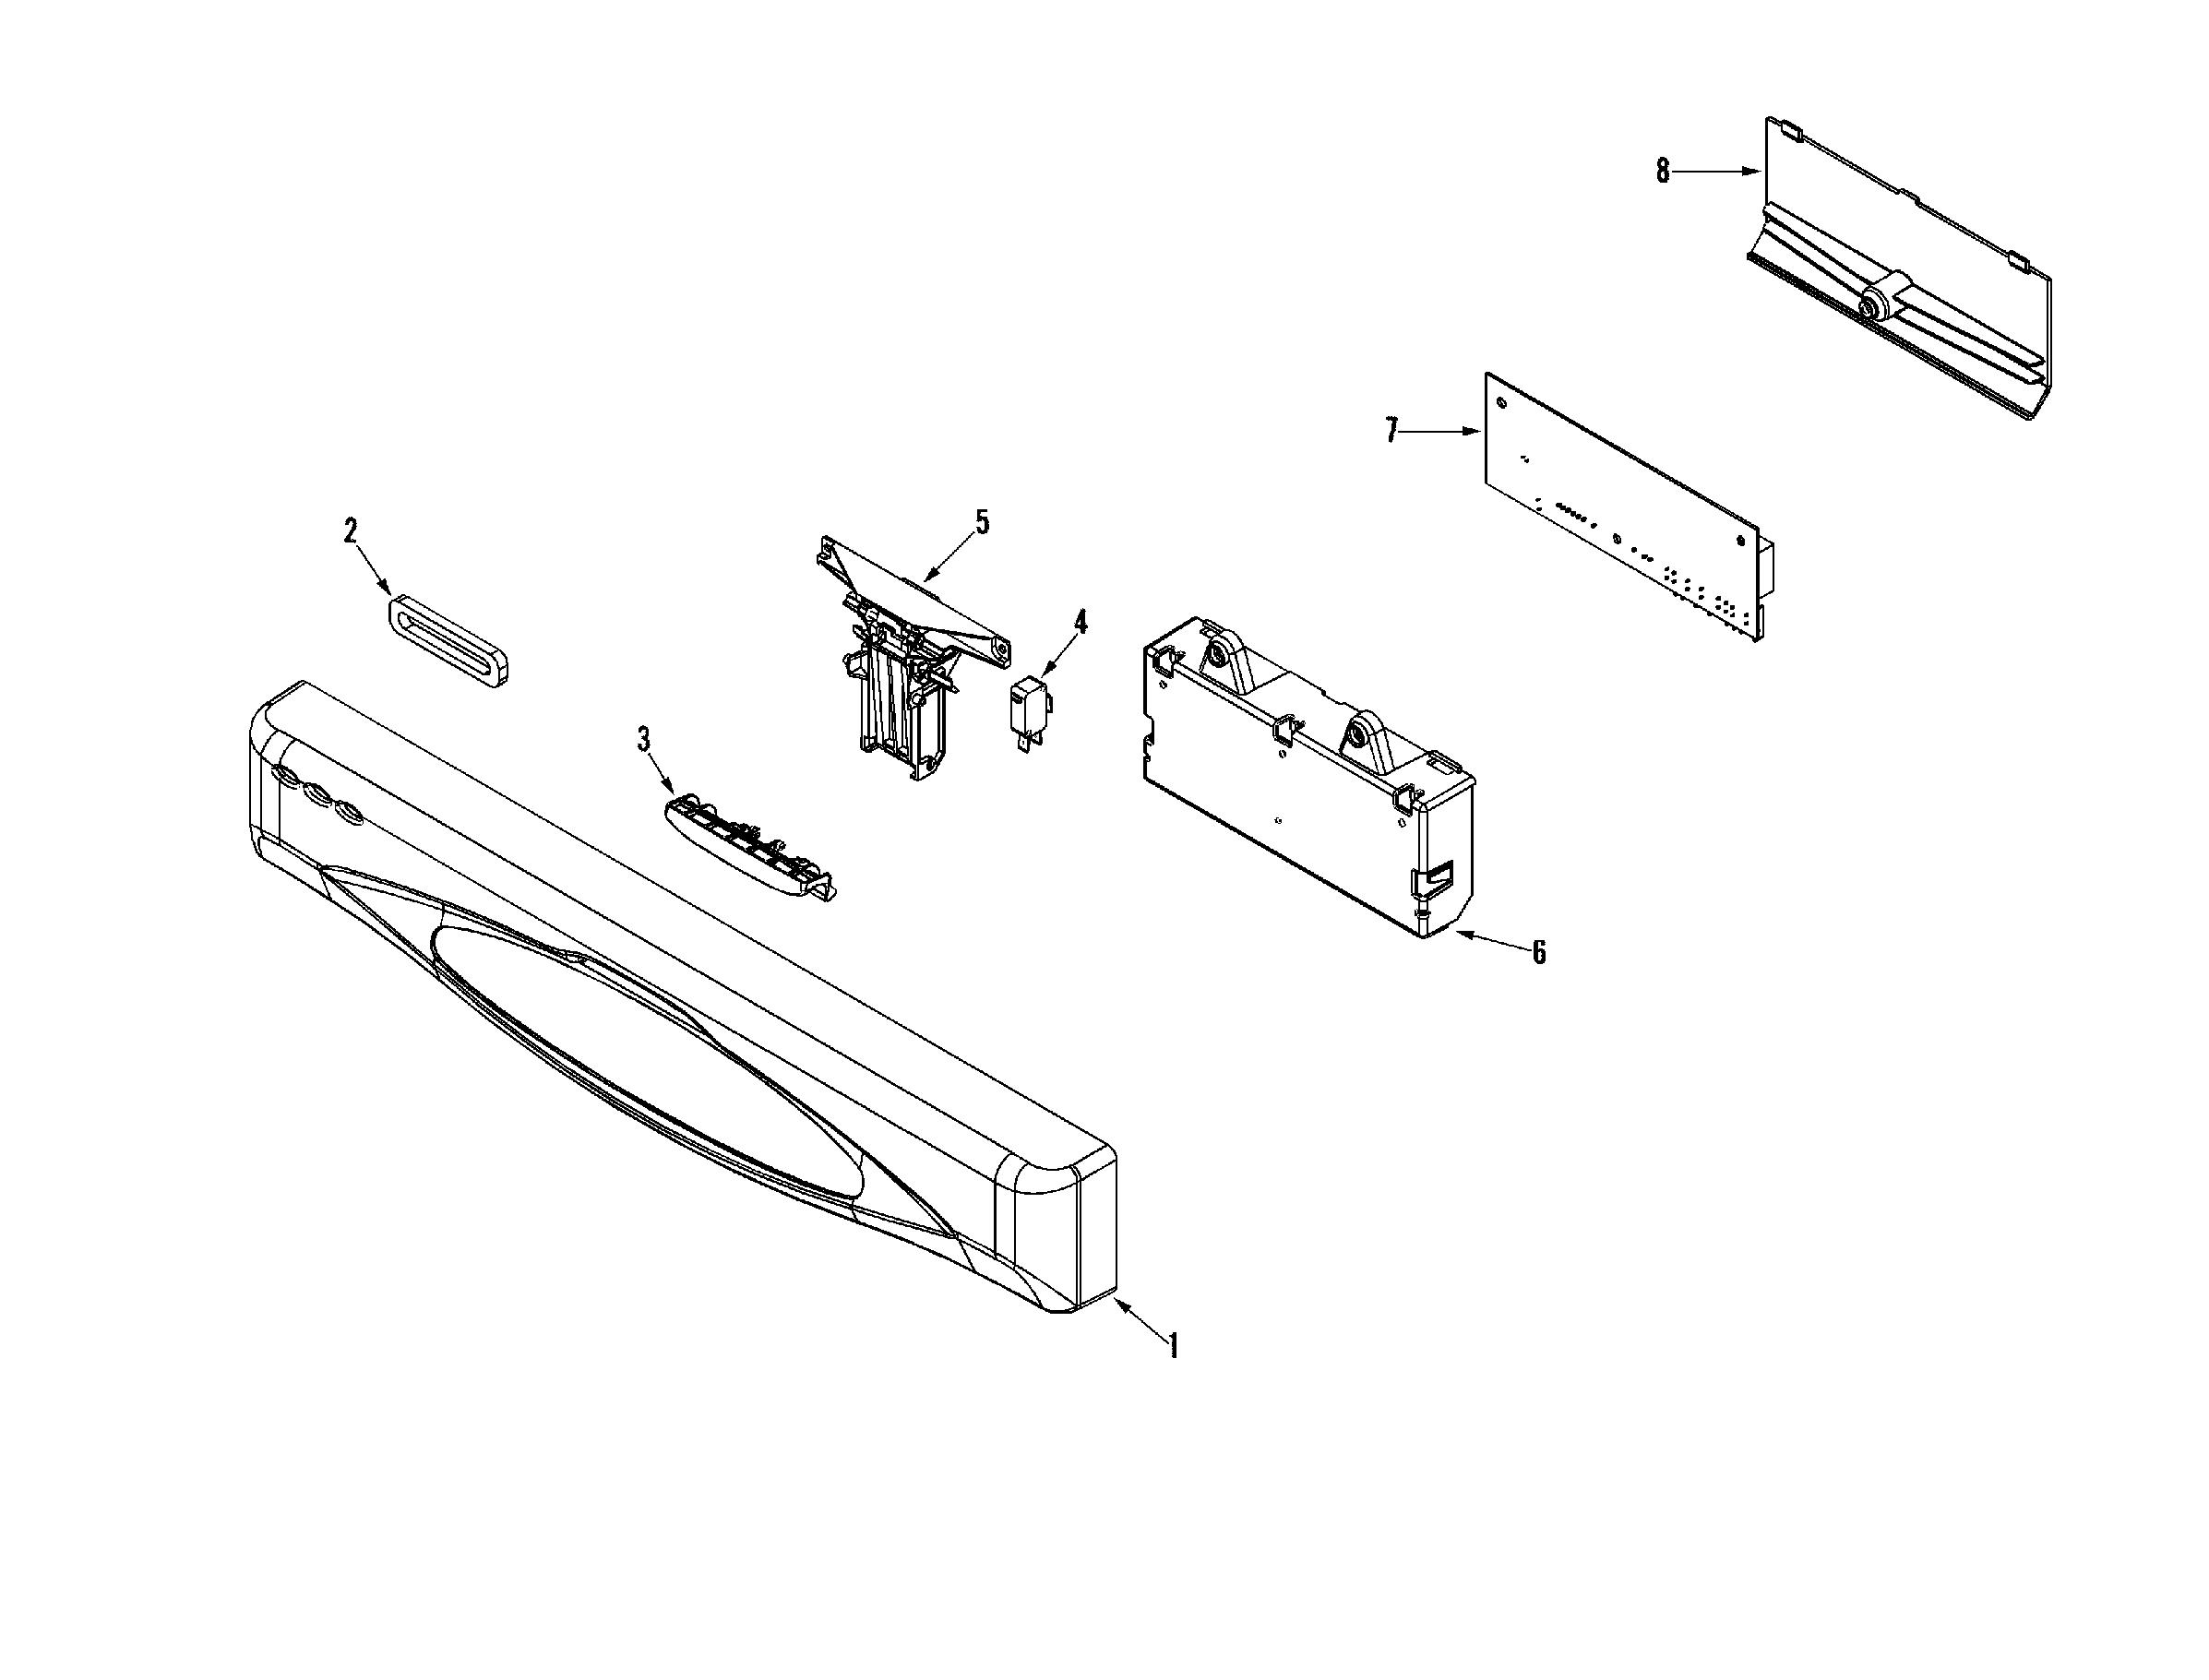 Maytag model MDB5600AWB dishwasher genuine parts